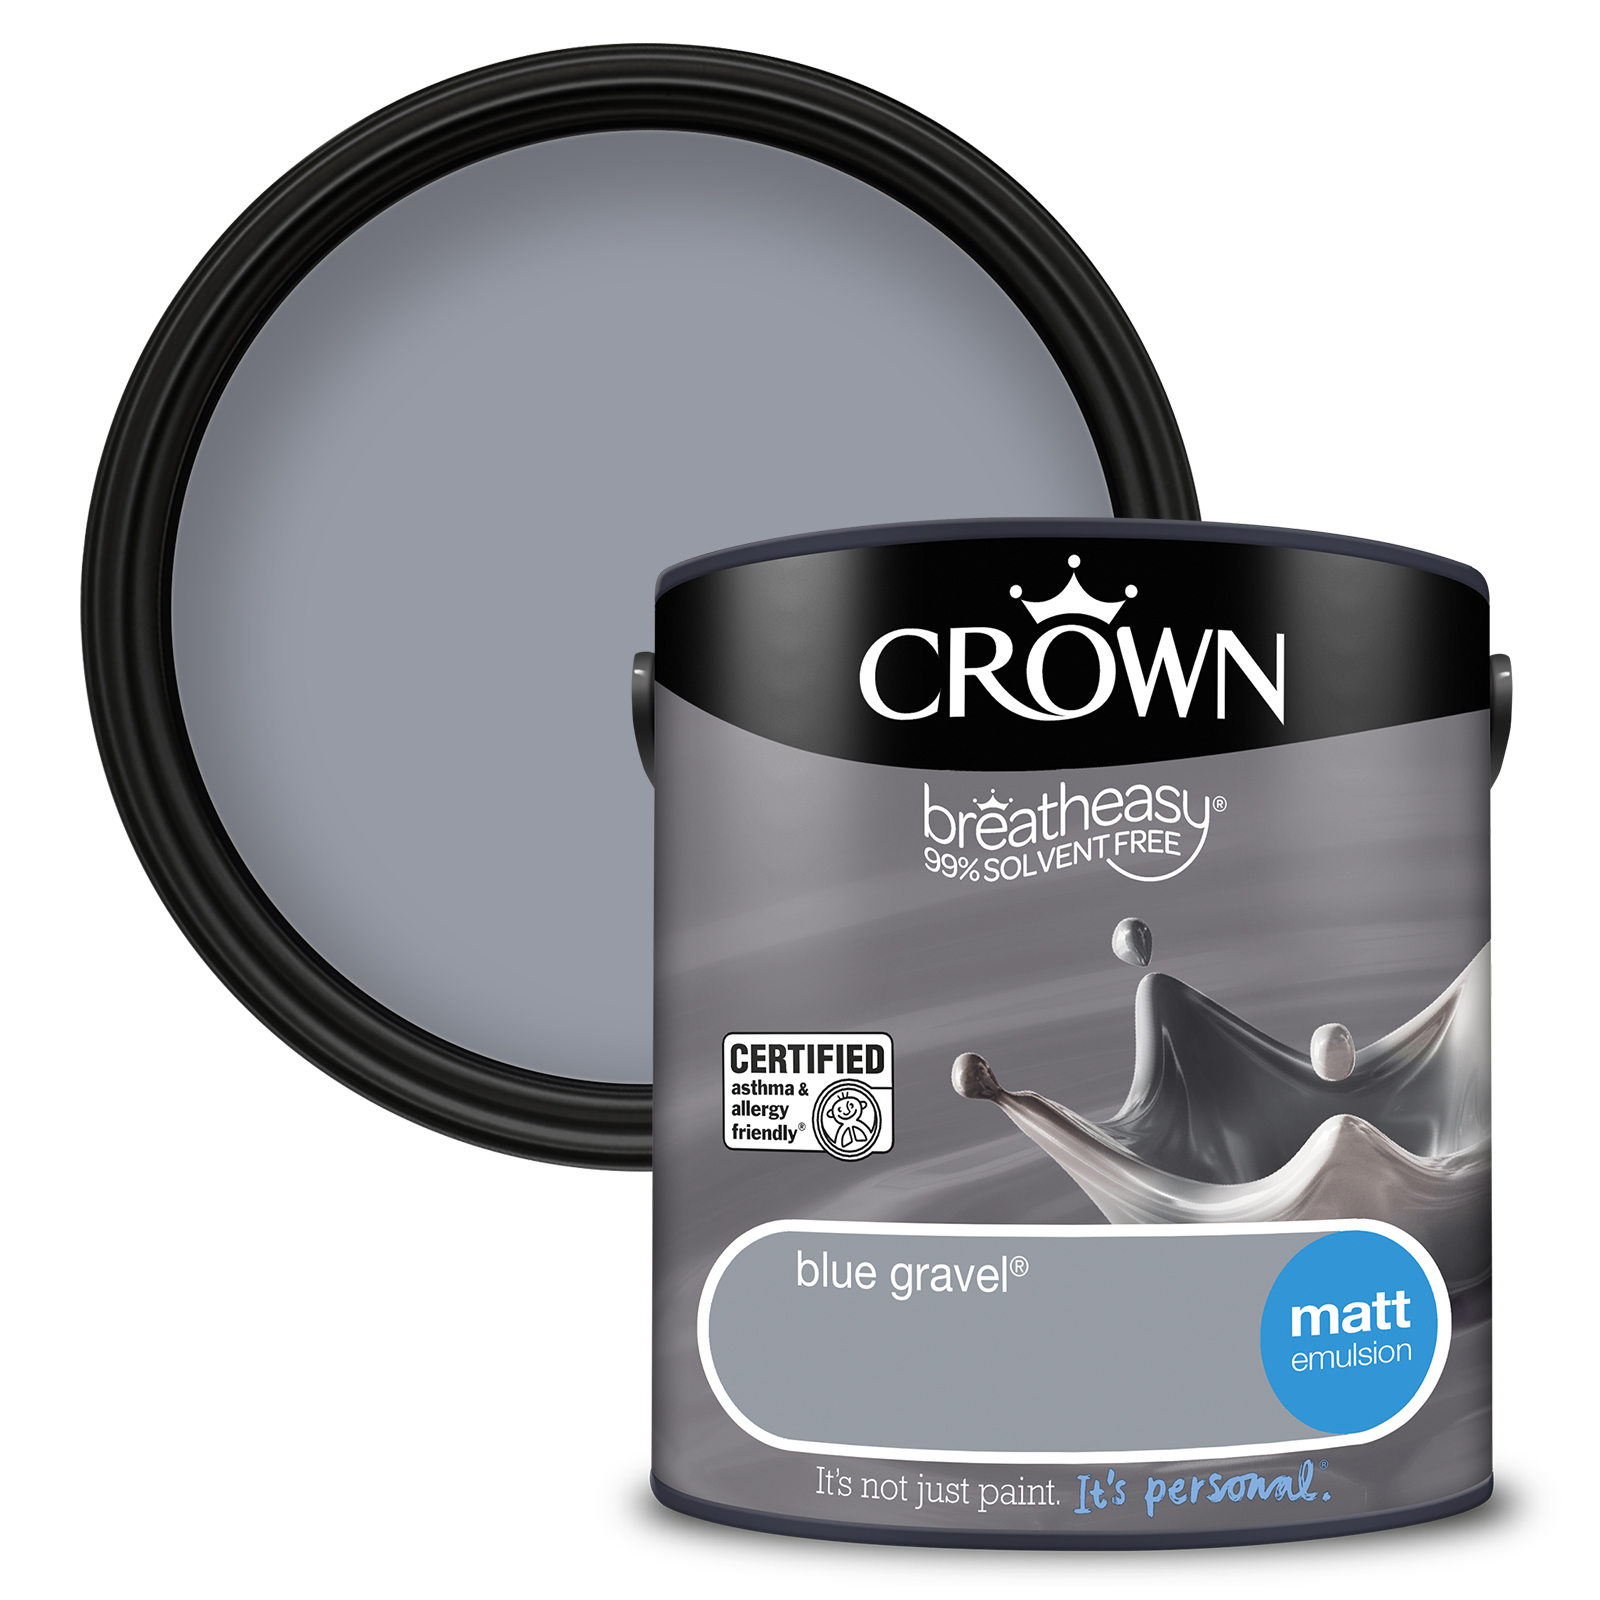 Crown Breatheasy Matt 2.5L - Blue Gravel